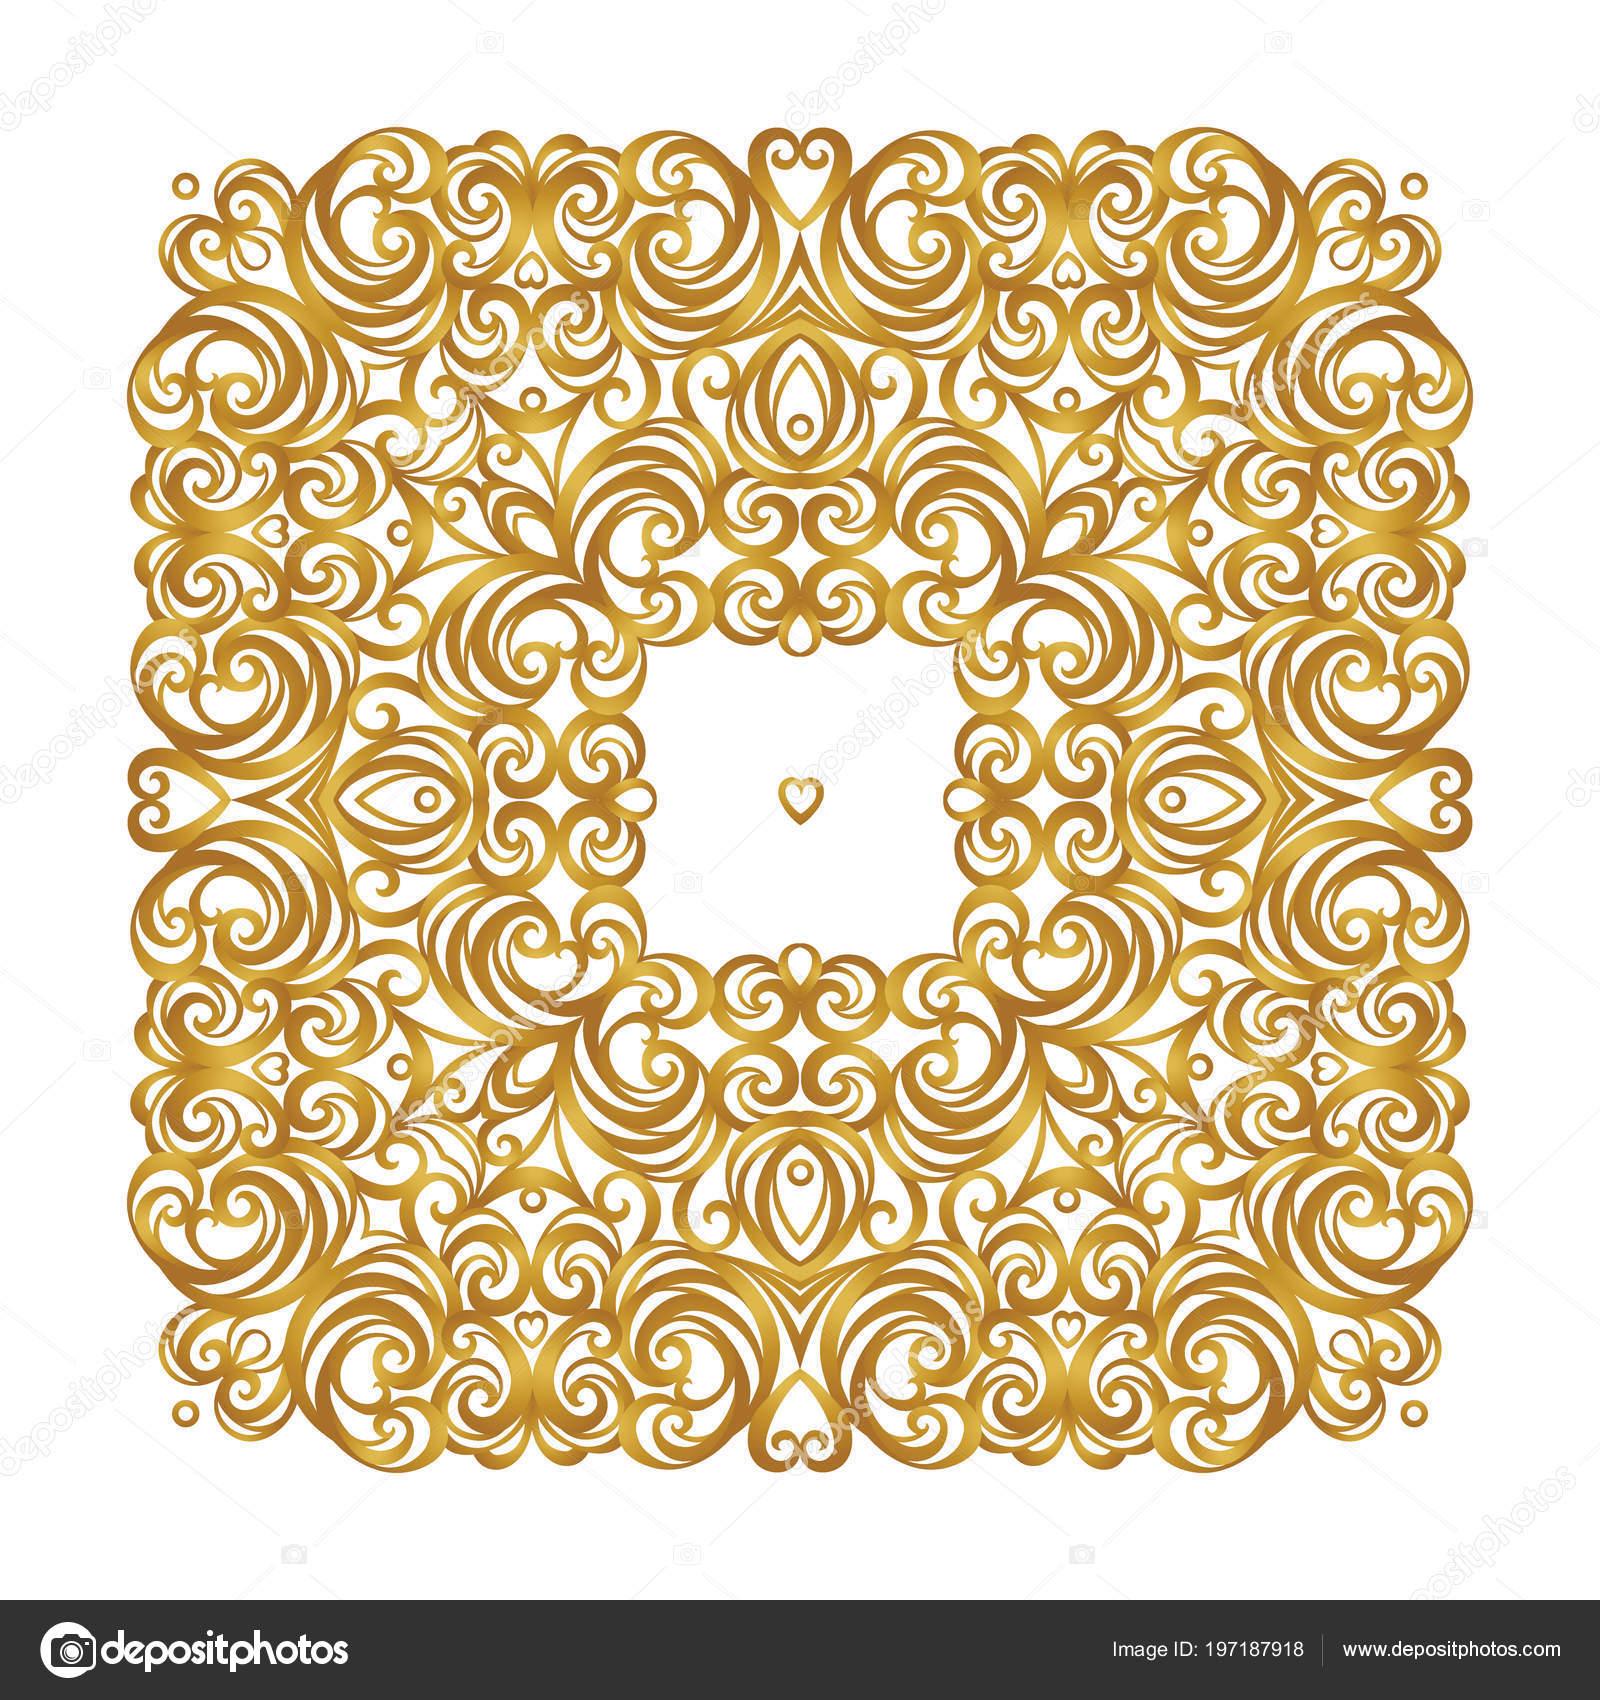 vector square vintage decor ornate floral ornament design template